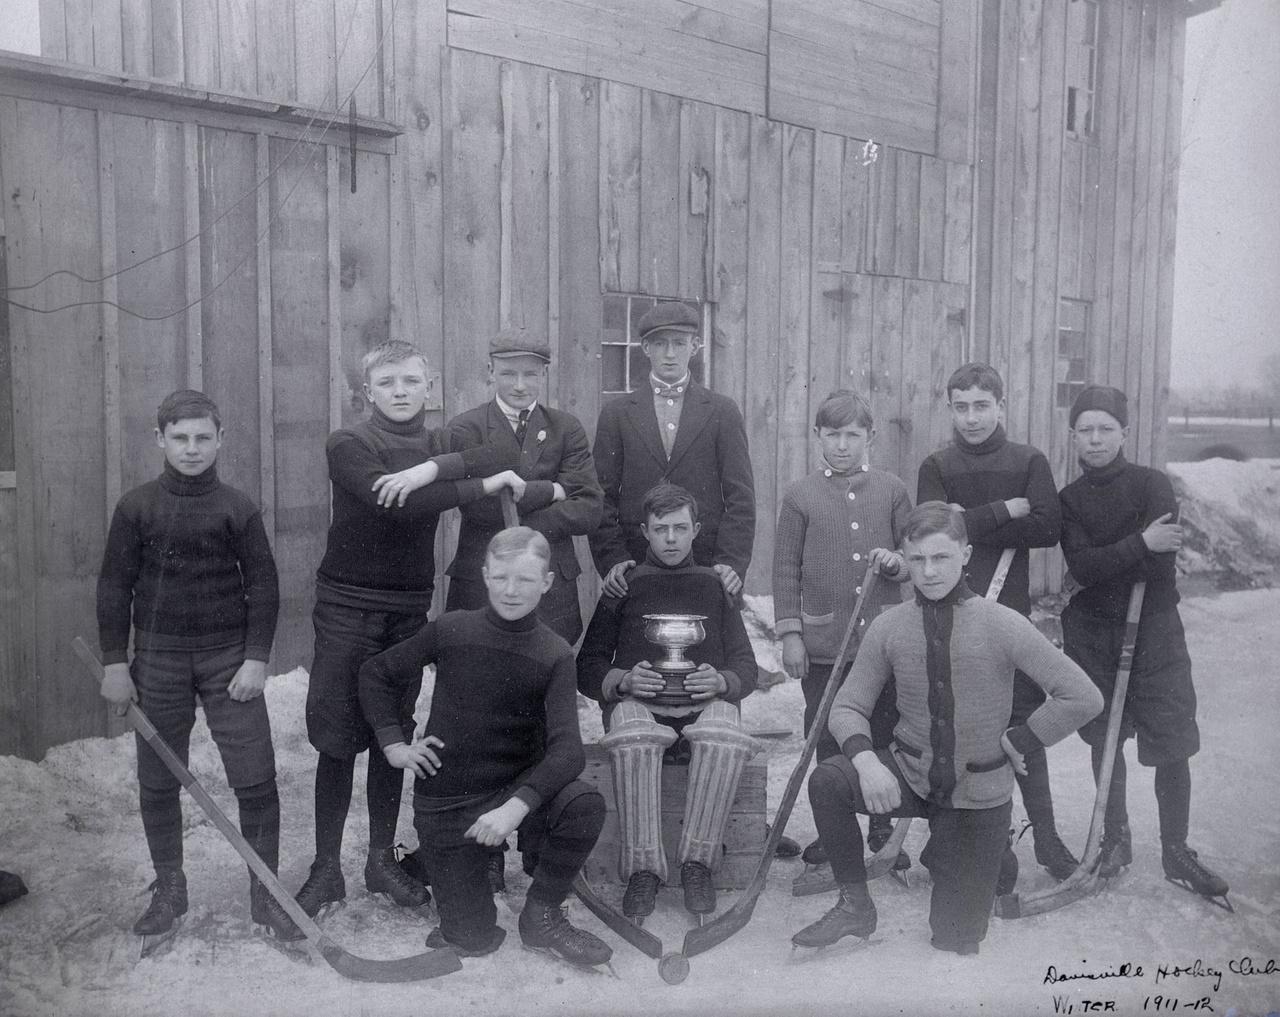 Davisville Hockey Club